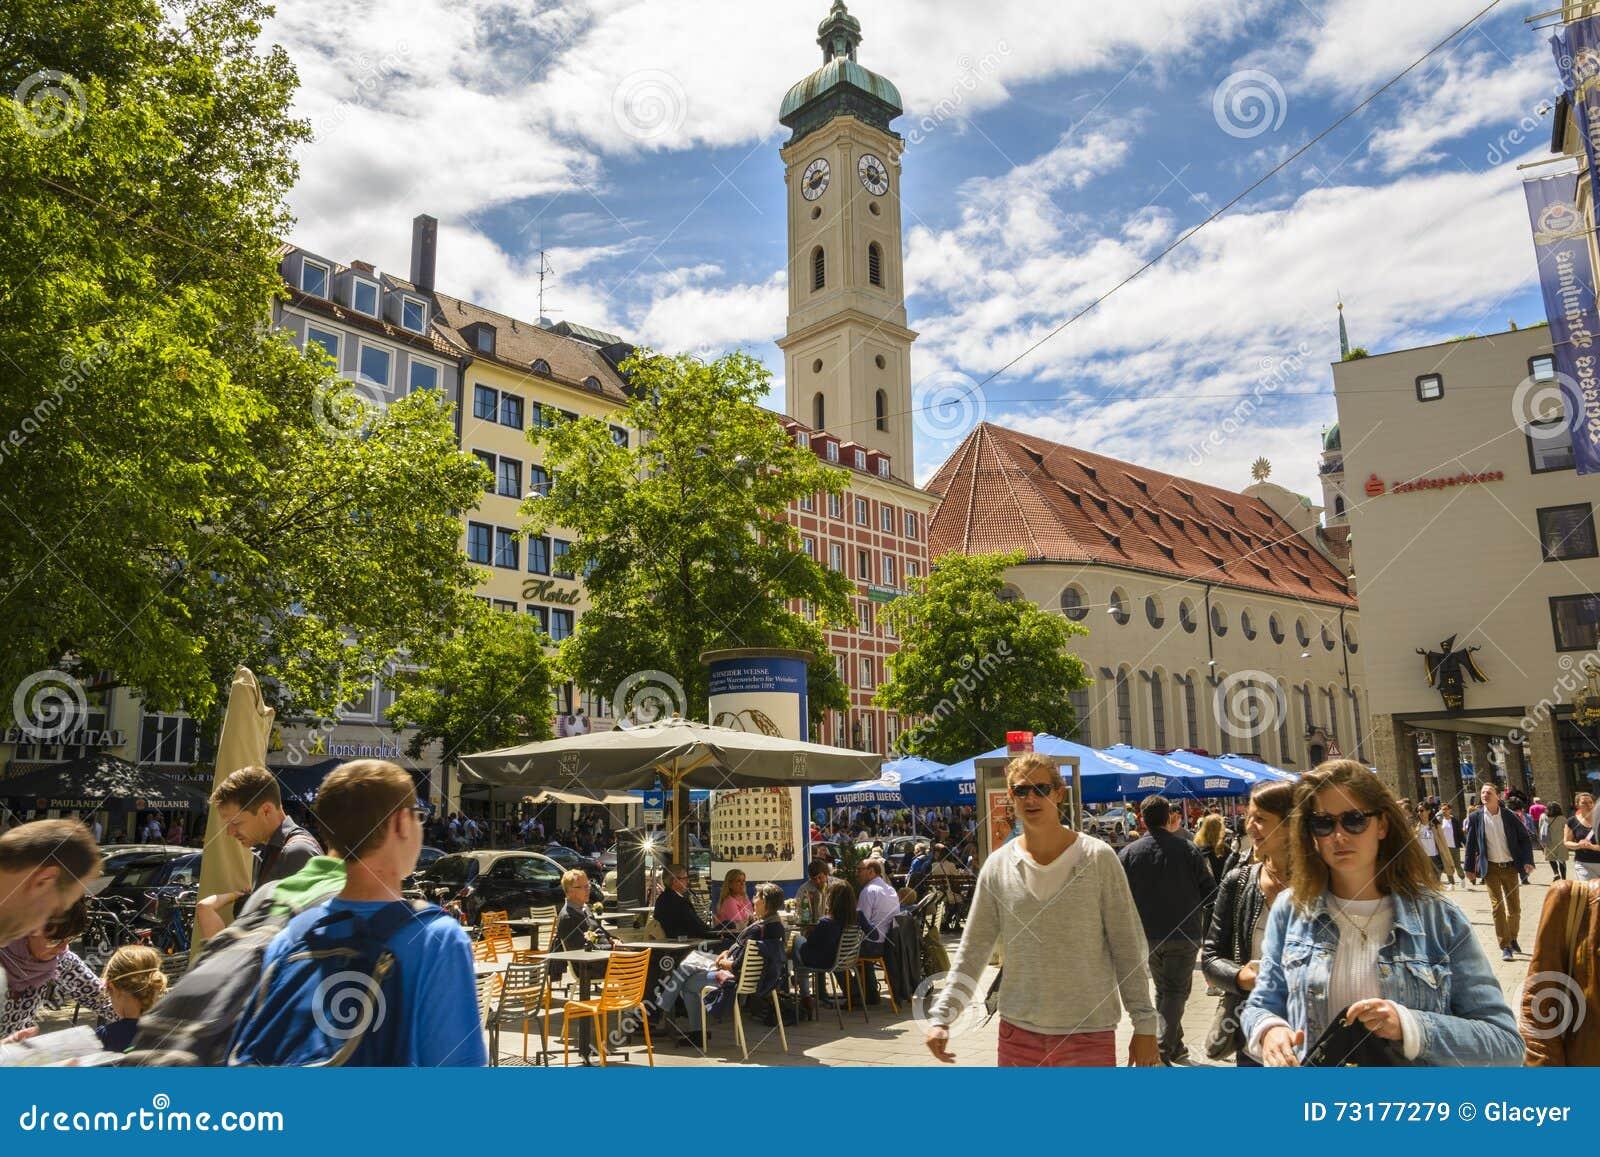 Munich Germany July 30 2015 Typical Charming City